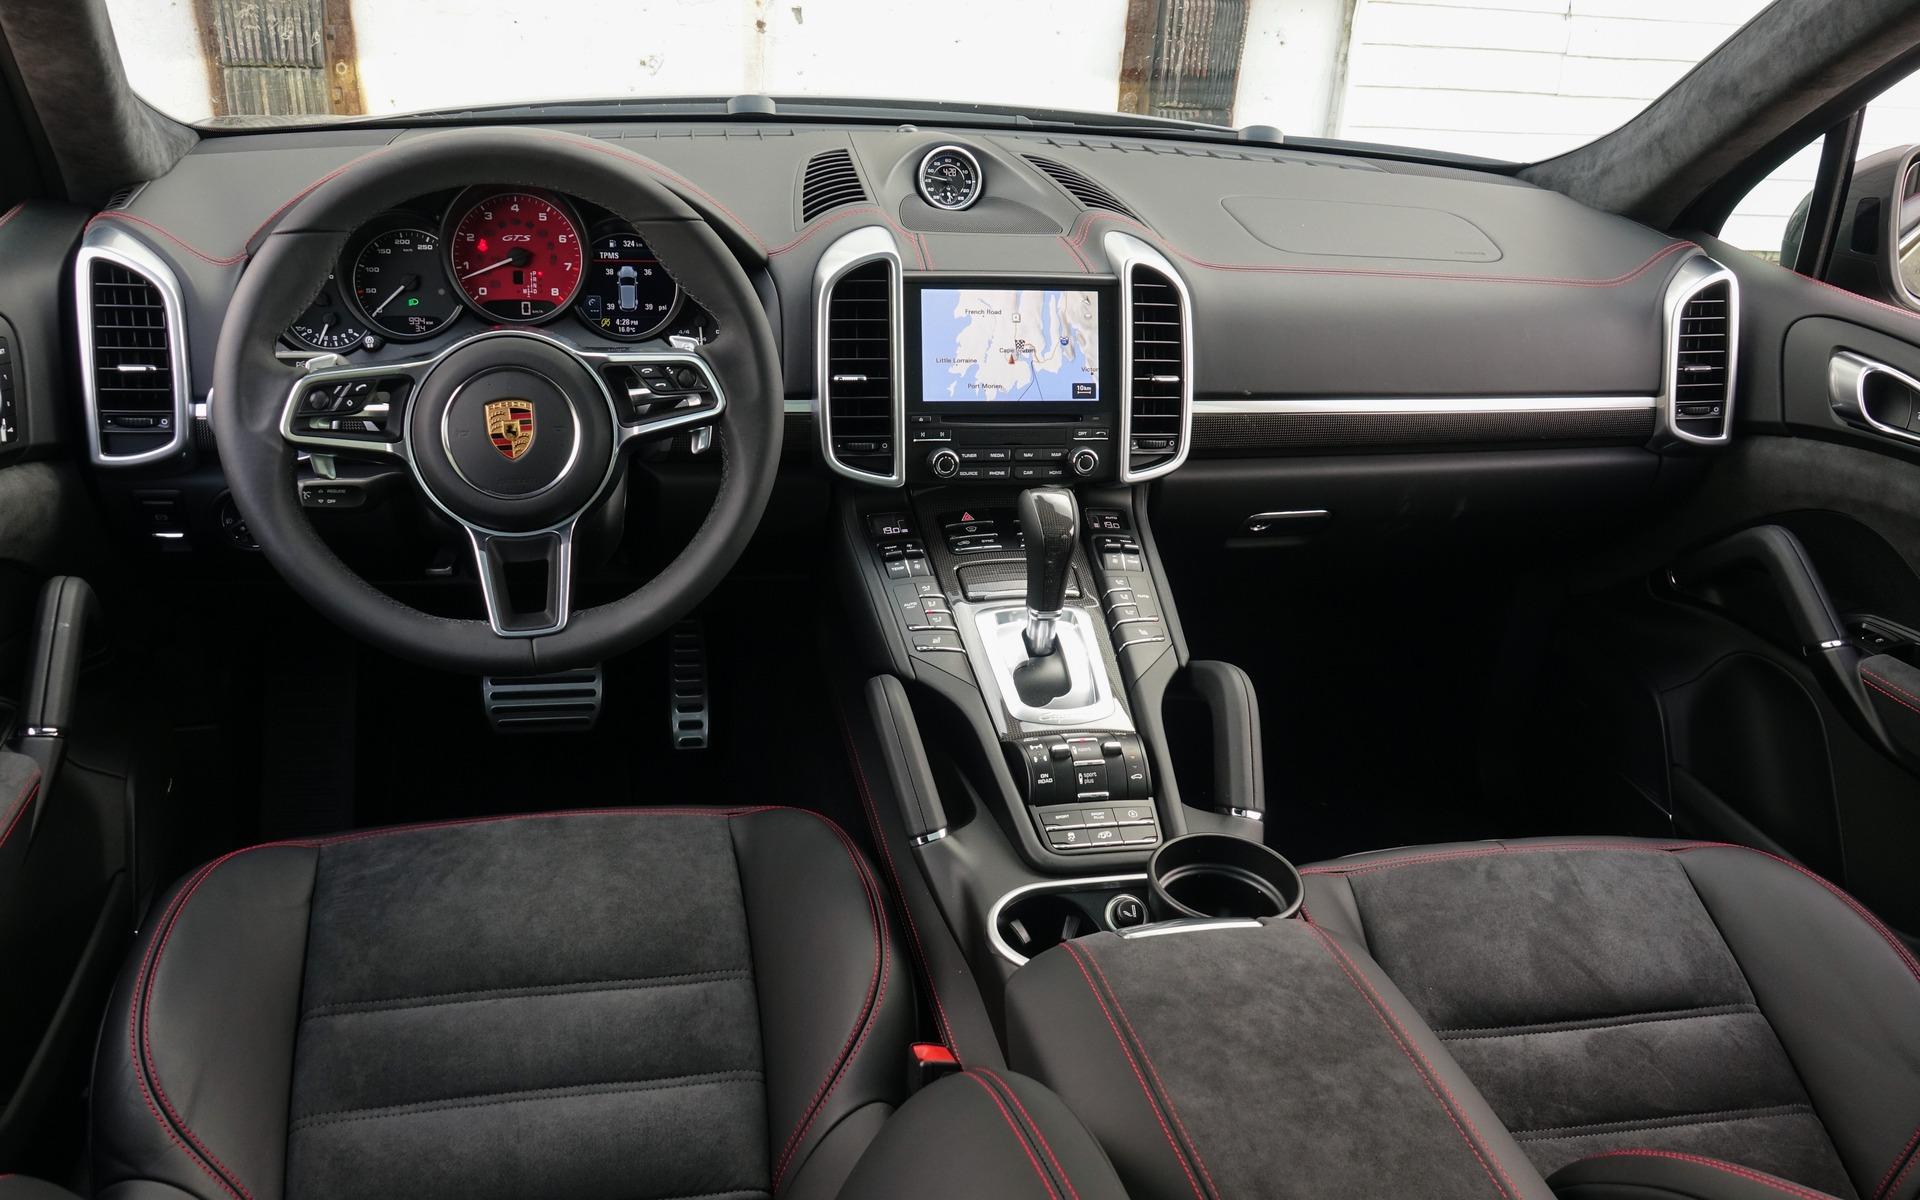 porsche cayenne interieur with  on F 13399 Auc3800946167488 besides 2019 Porsche Cayenne  parison further  together with Verkauf de mus 844855 additionally Ferrari F430.